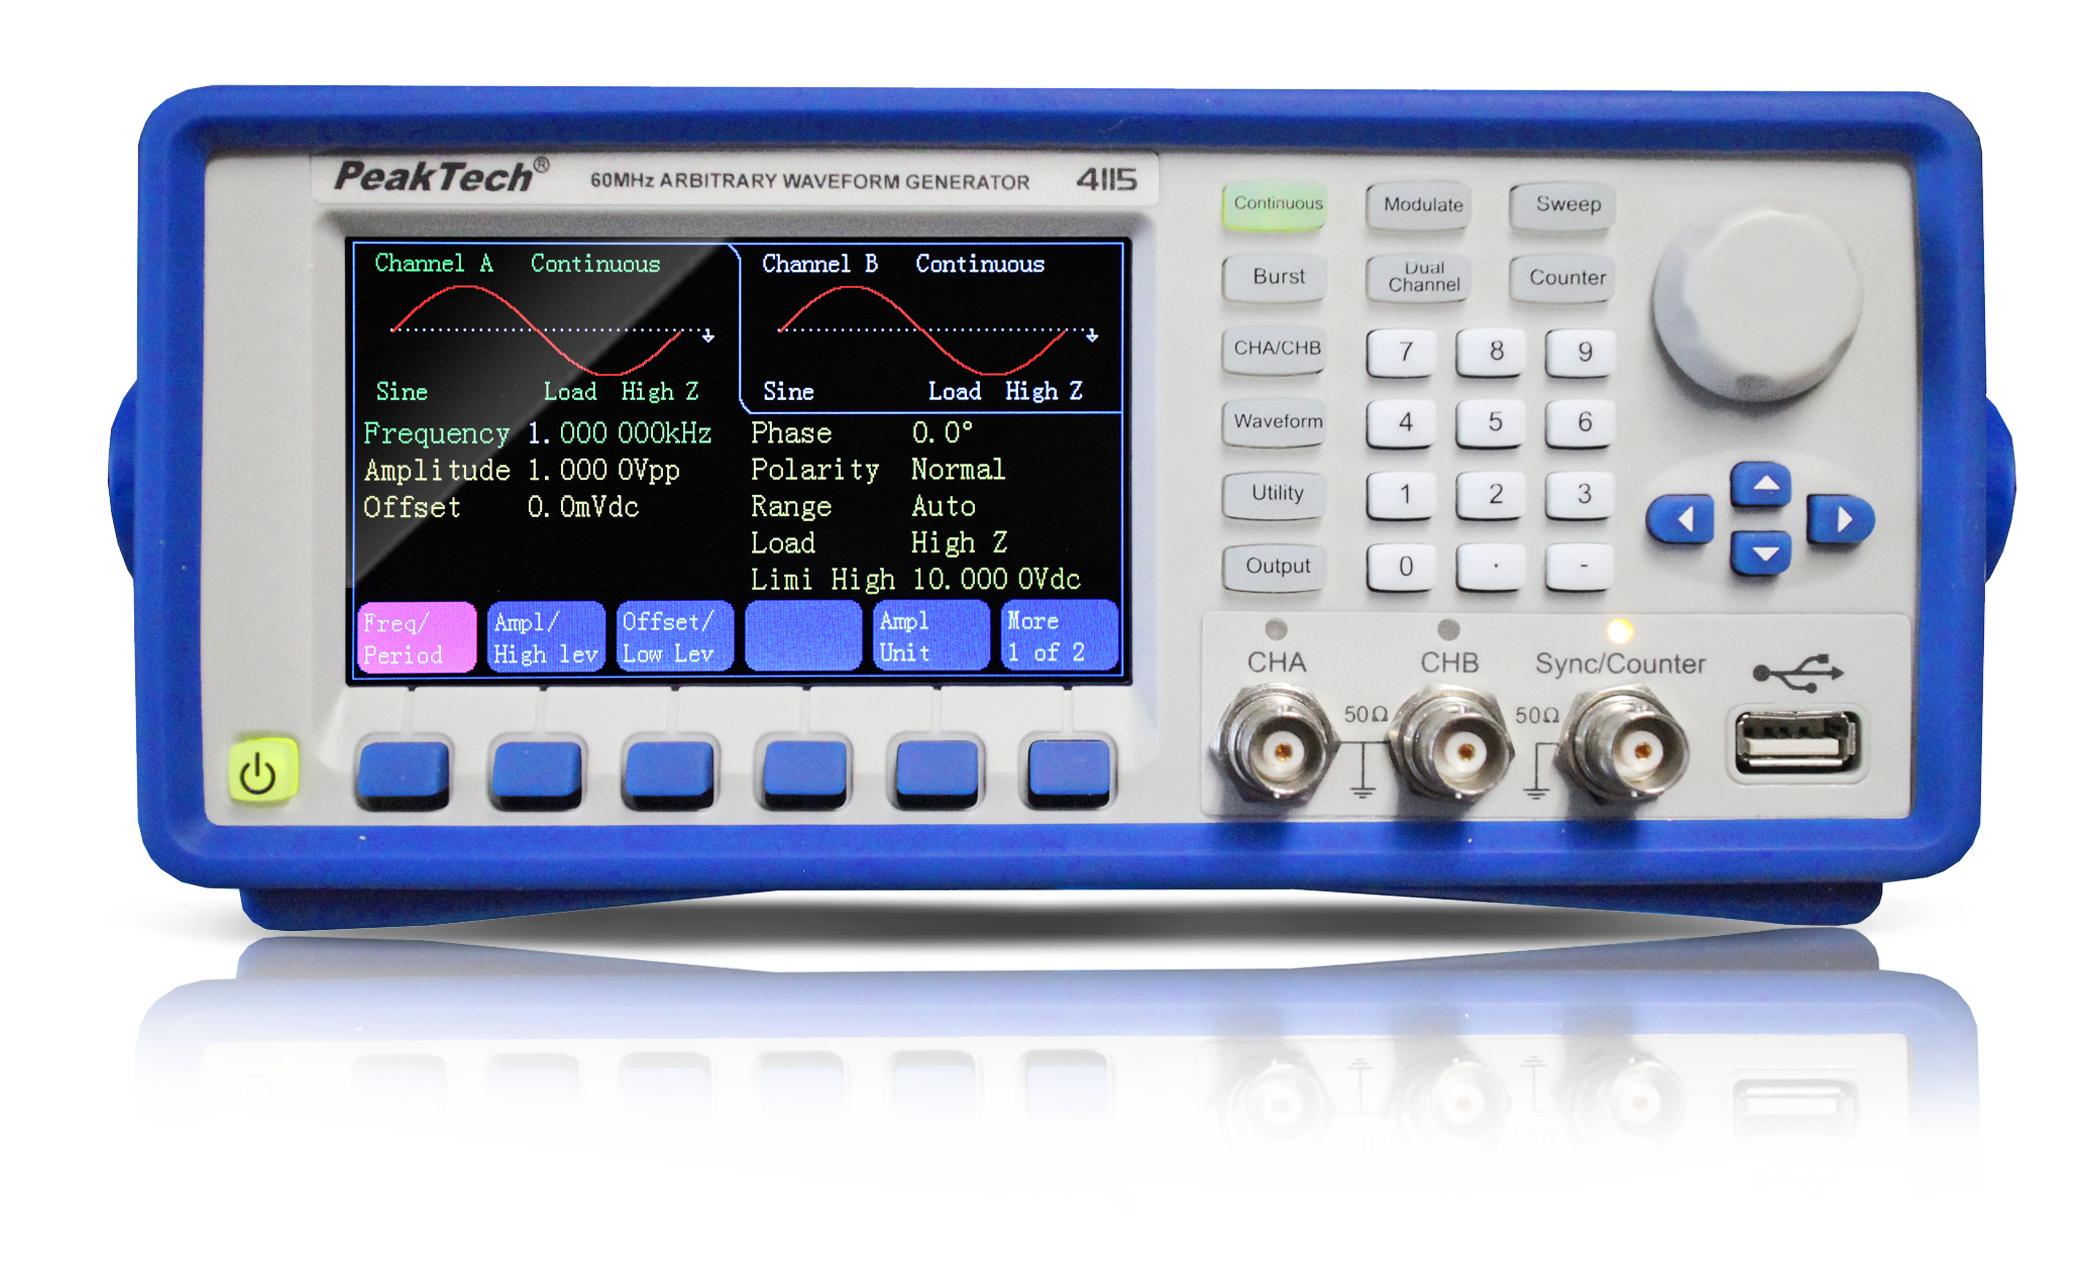 «PeakTech® P 4115» 2CH arbitrary function generator, 1 µHz - 60 MHz